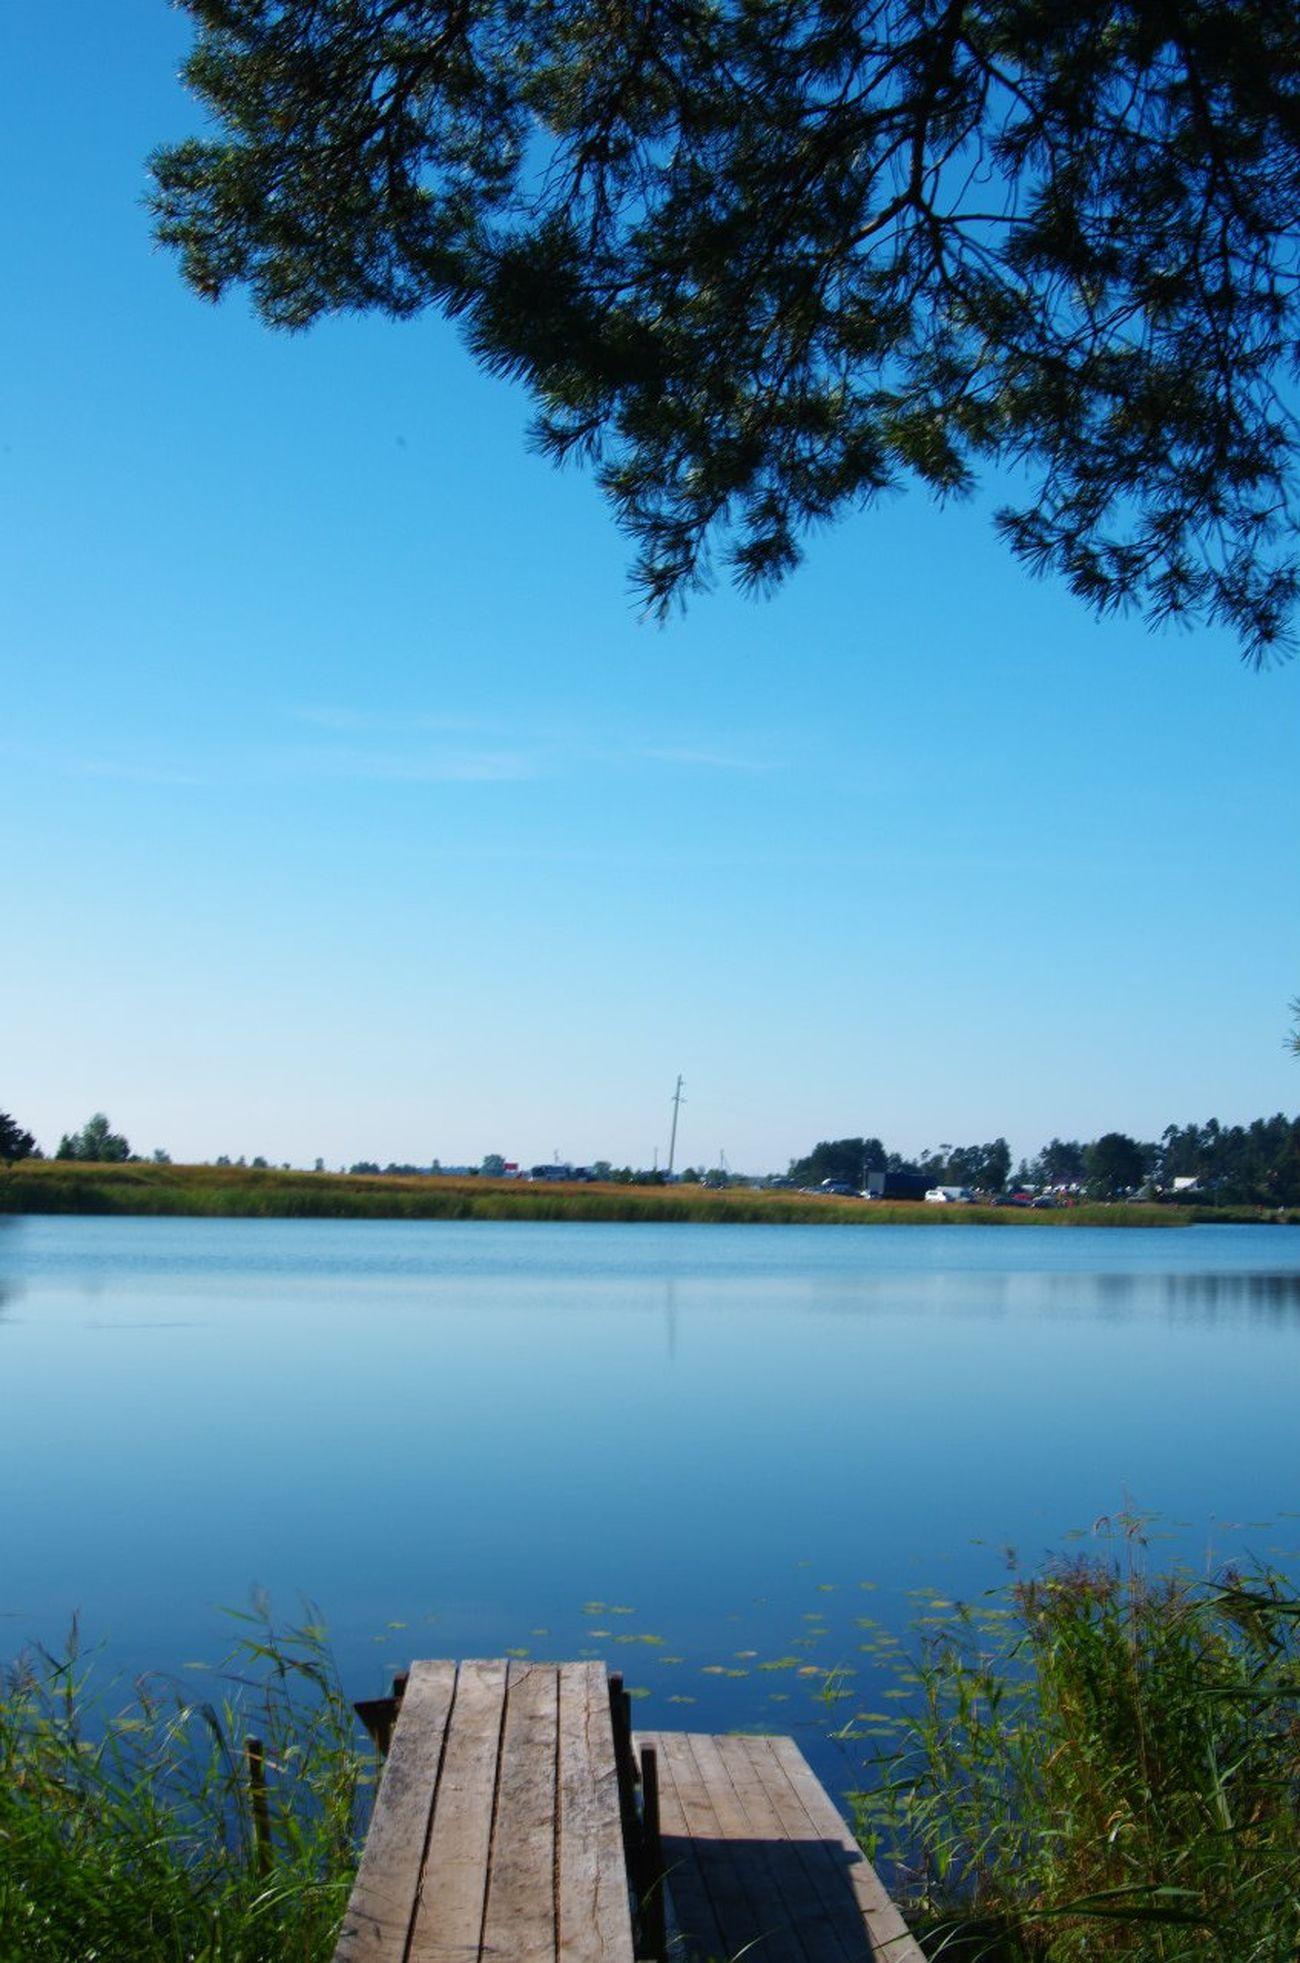 Summer Summer Lake Seliger селигер2014 селигер Lake